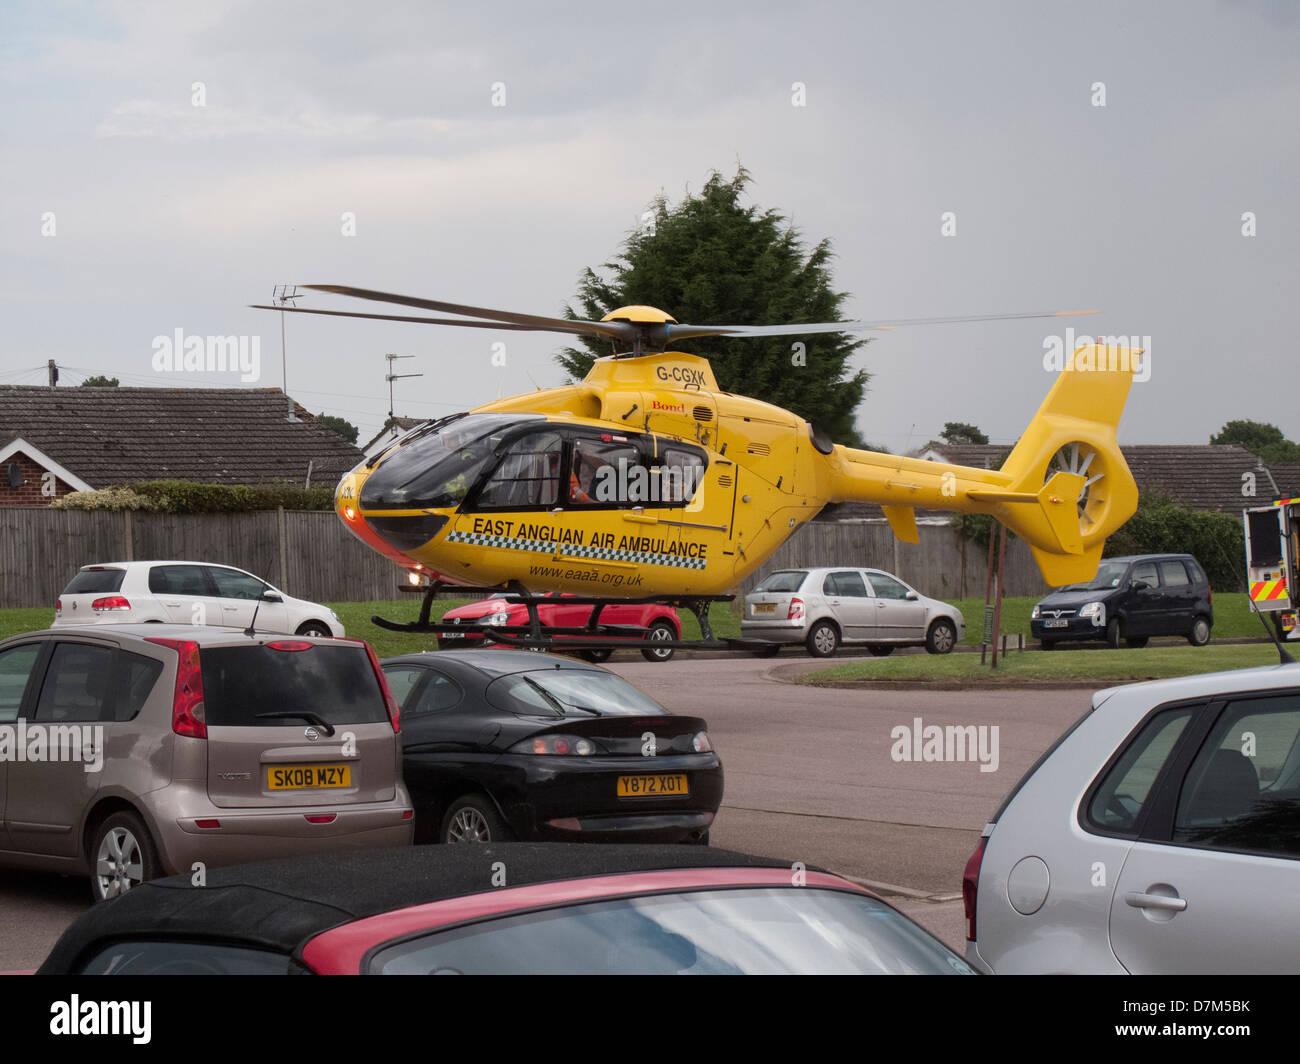 East Anglian Air Ambulance landing in car park in Aylsham Norfolk - Stock Image